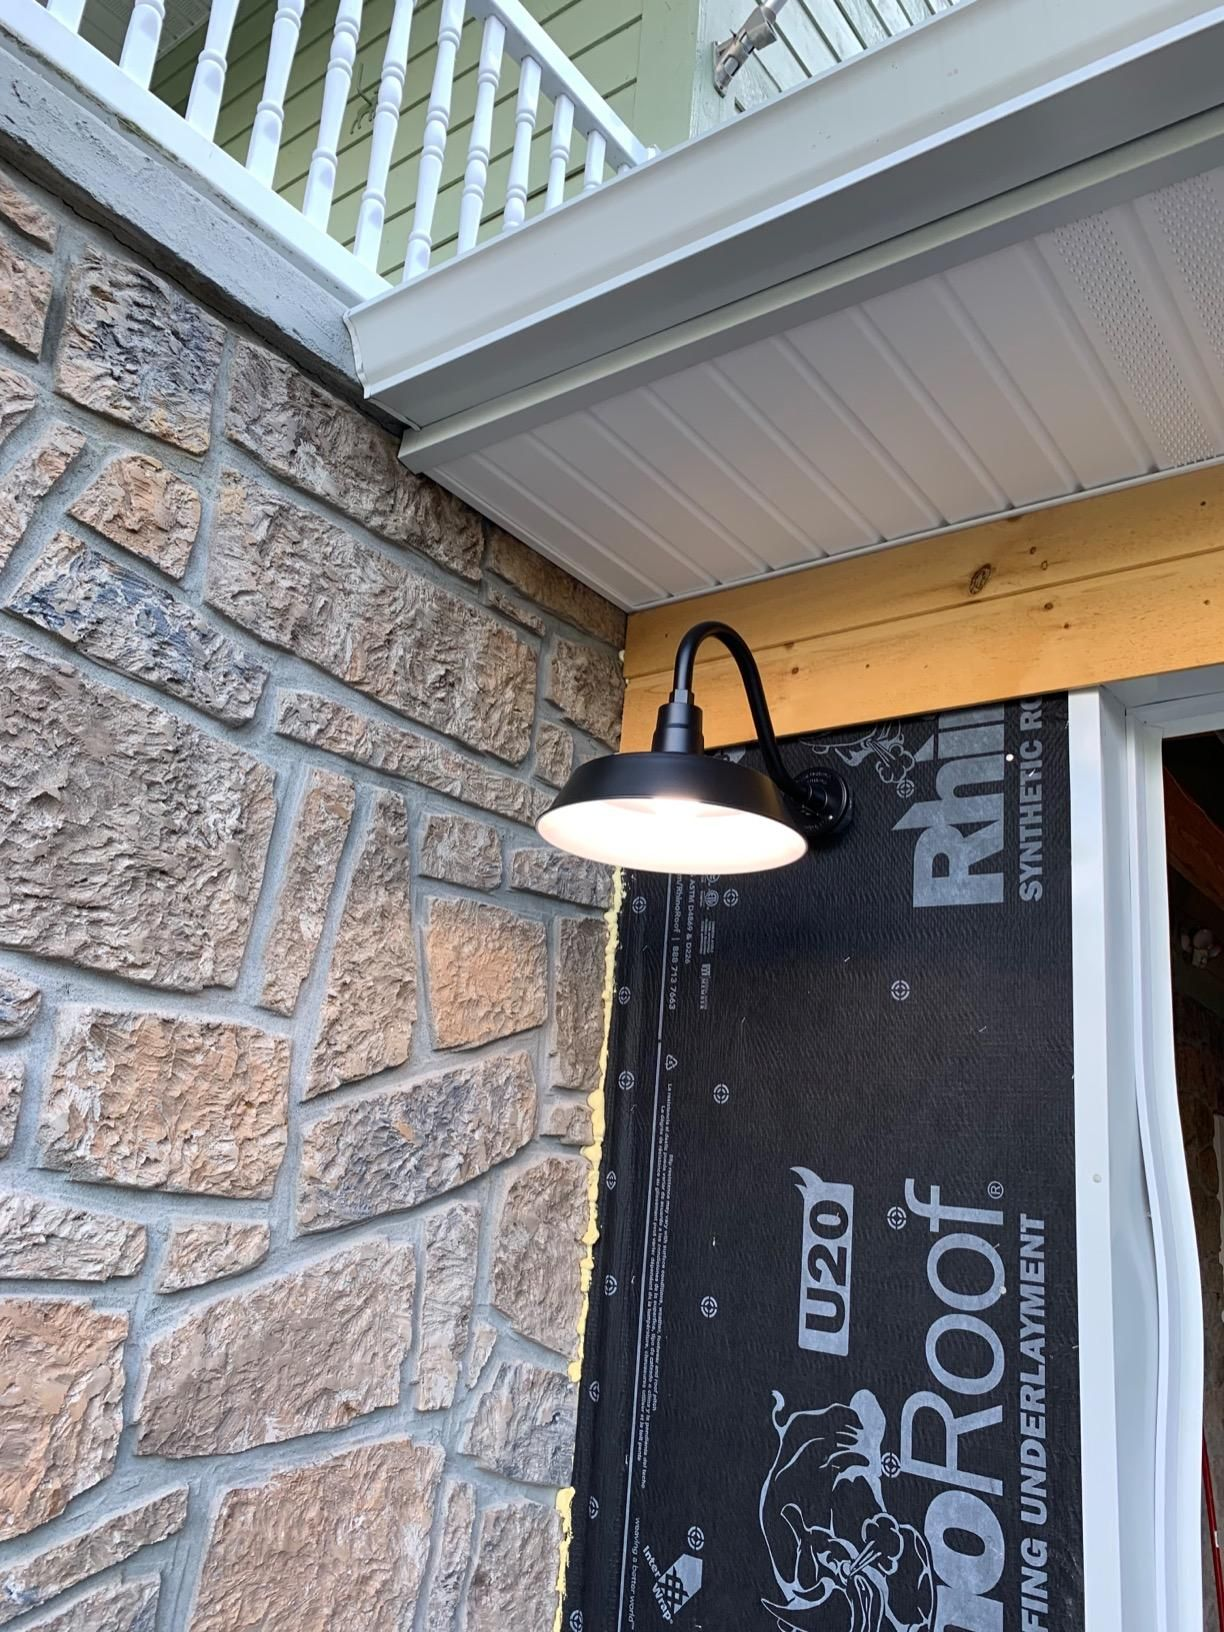 Pin By Htm Lighting On Gooseneck Barn Lights Barn Lighting Barn Light Fixtures Light Fixtures